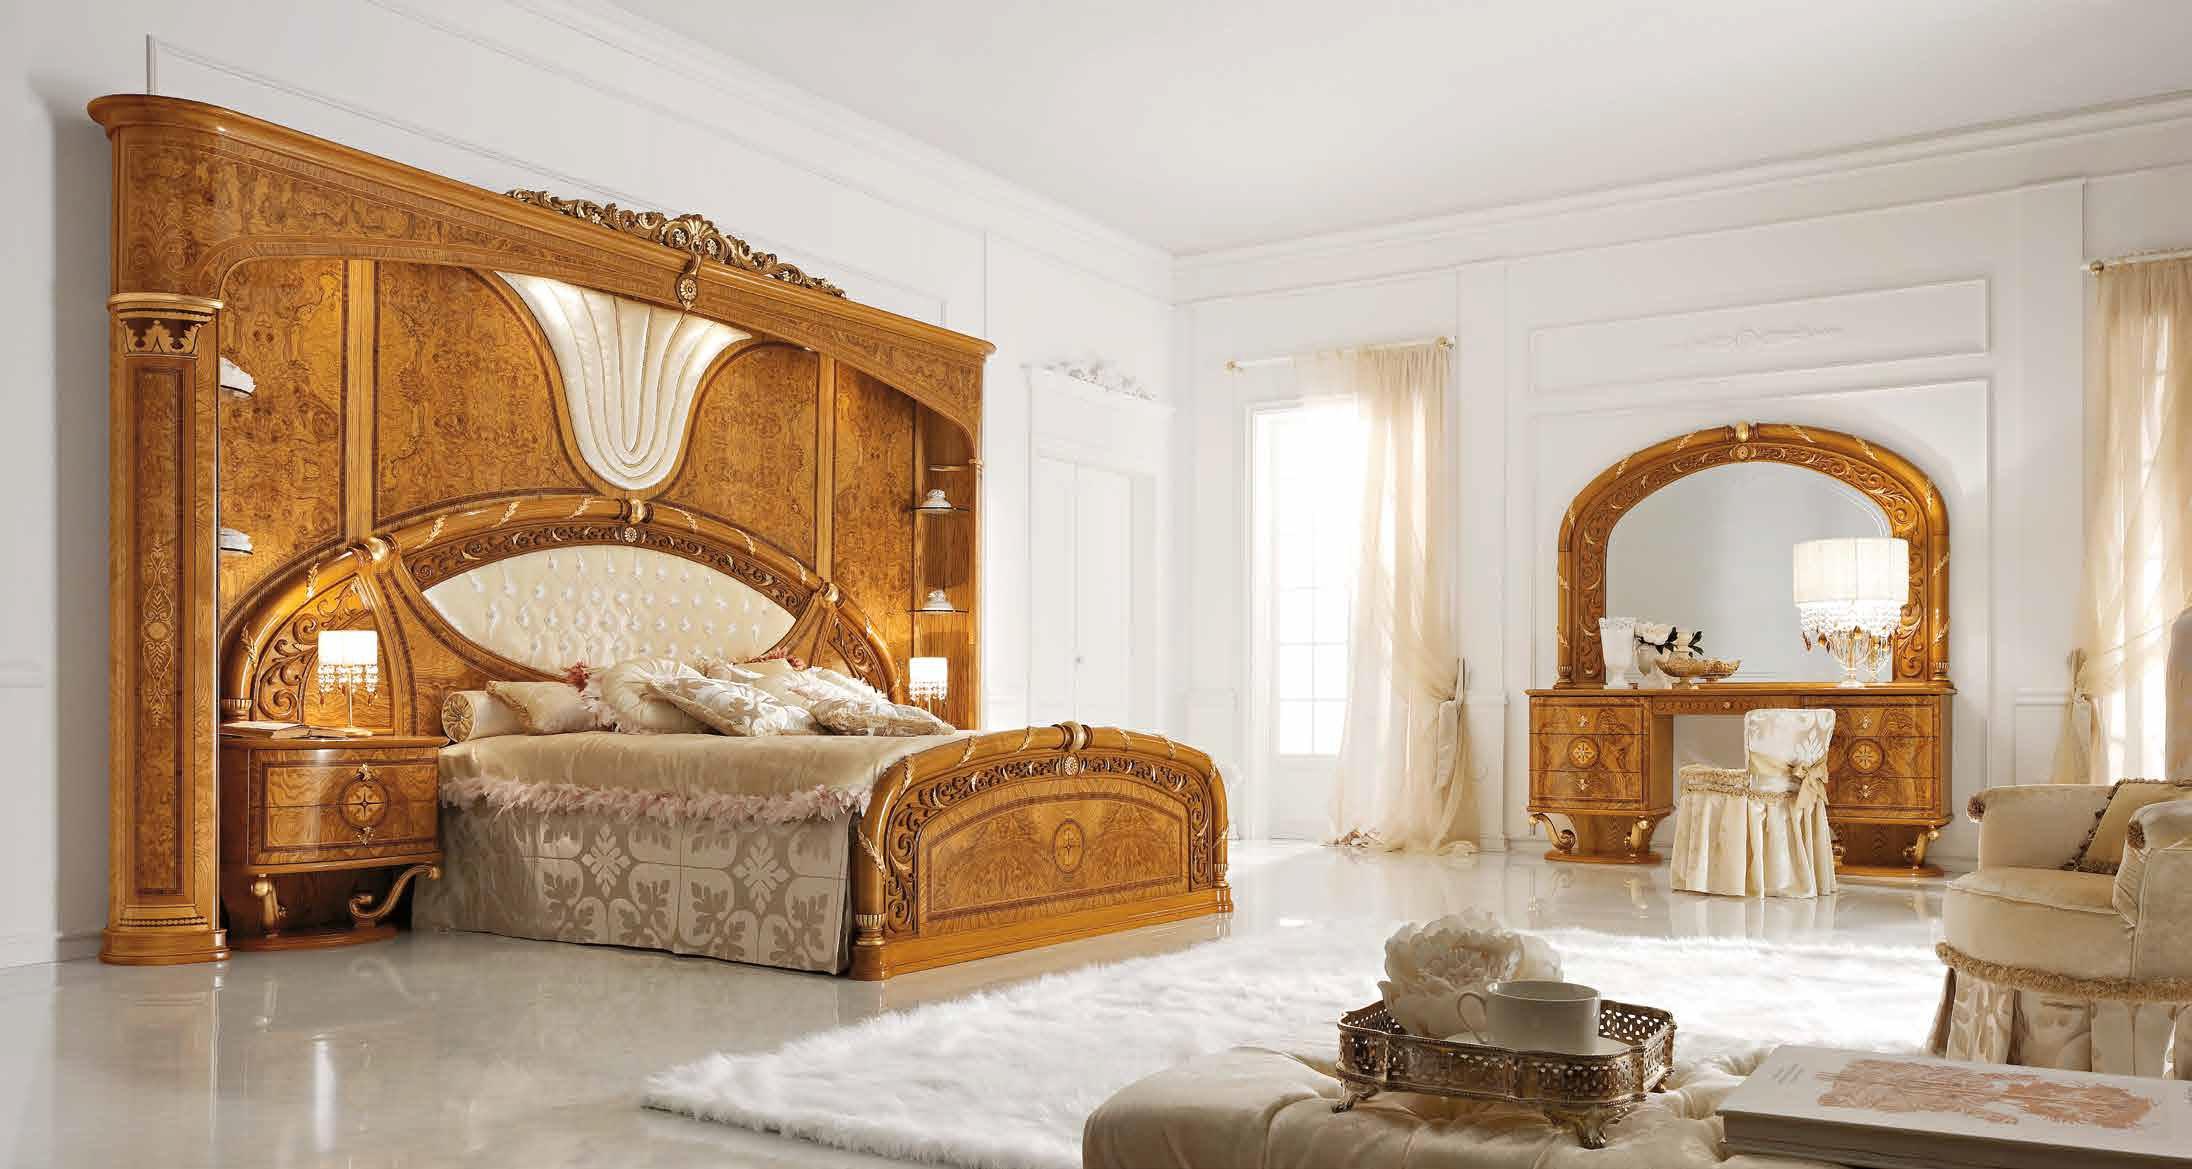 Сучасні італійські меблі інтернет-магазин